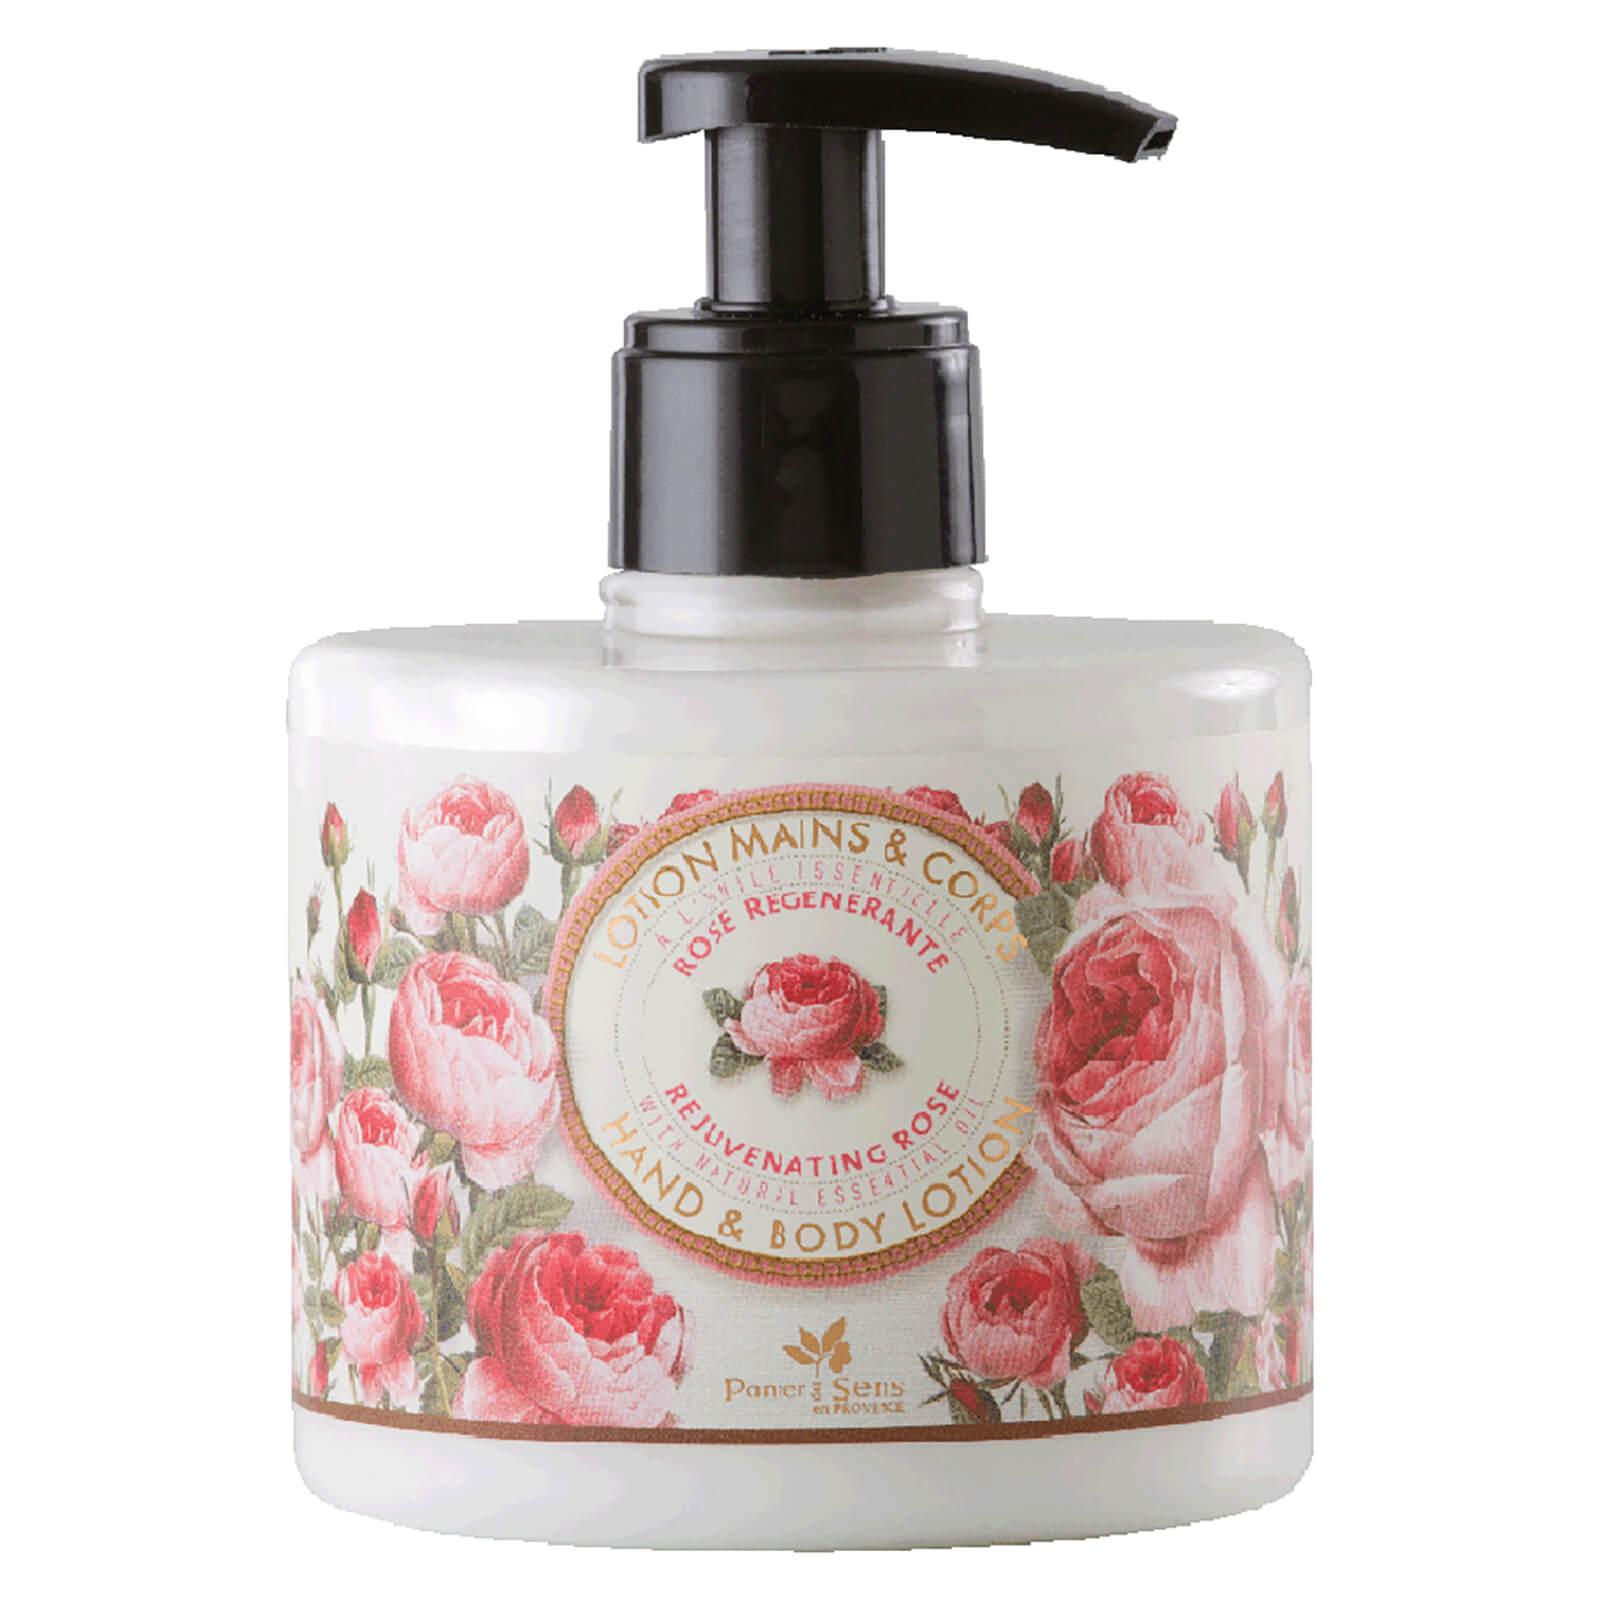 Купить Panier des Sens The Essentials Rejuvenating Rose Hand & Body Lotion